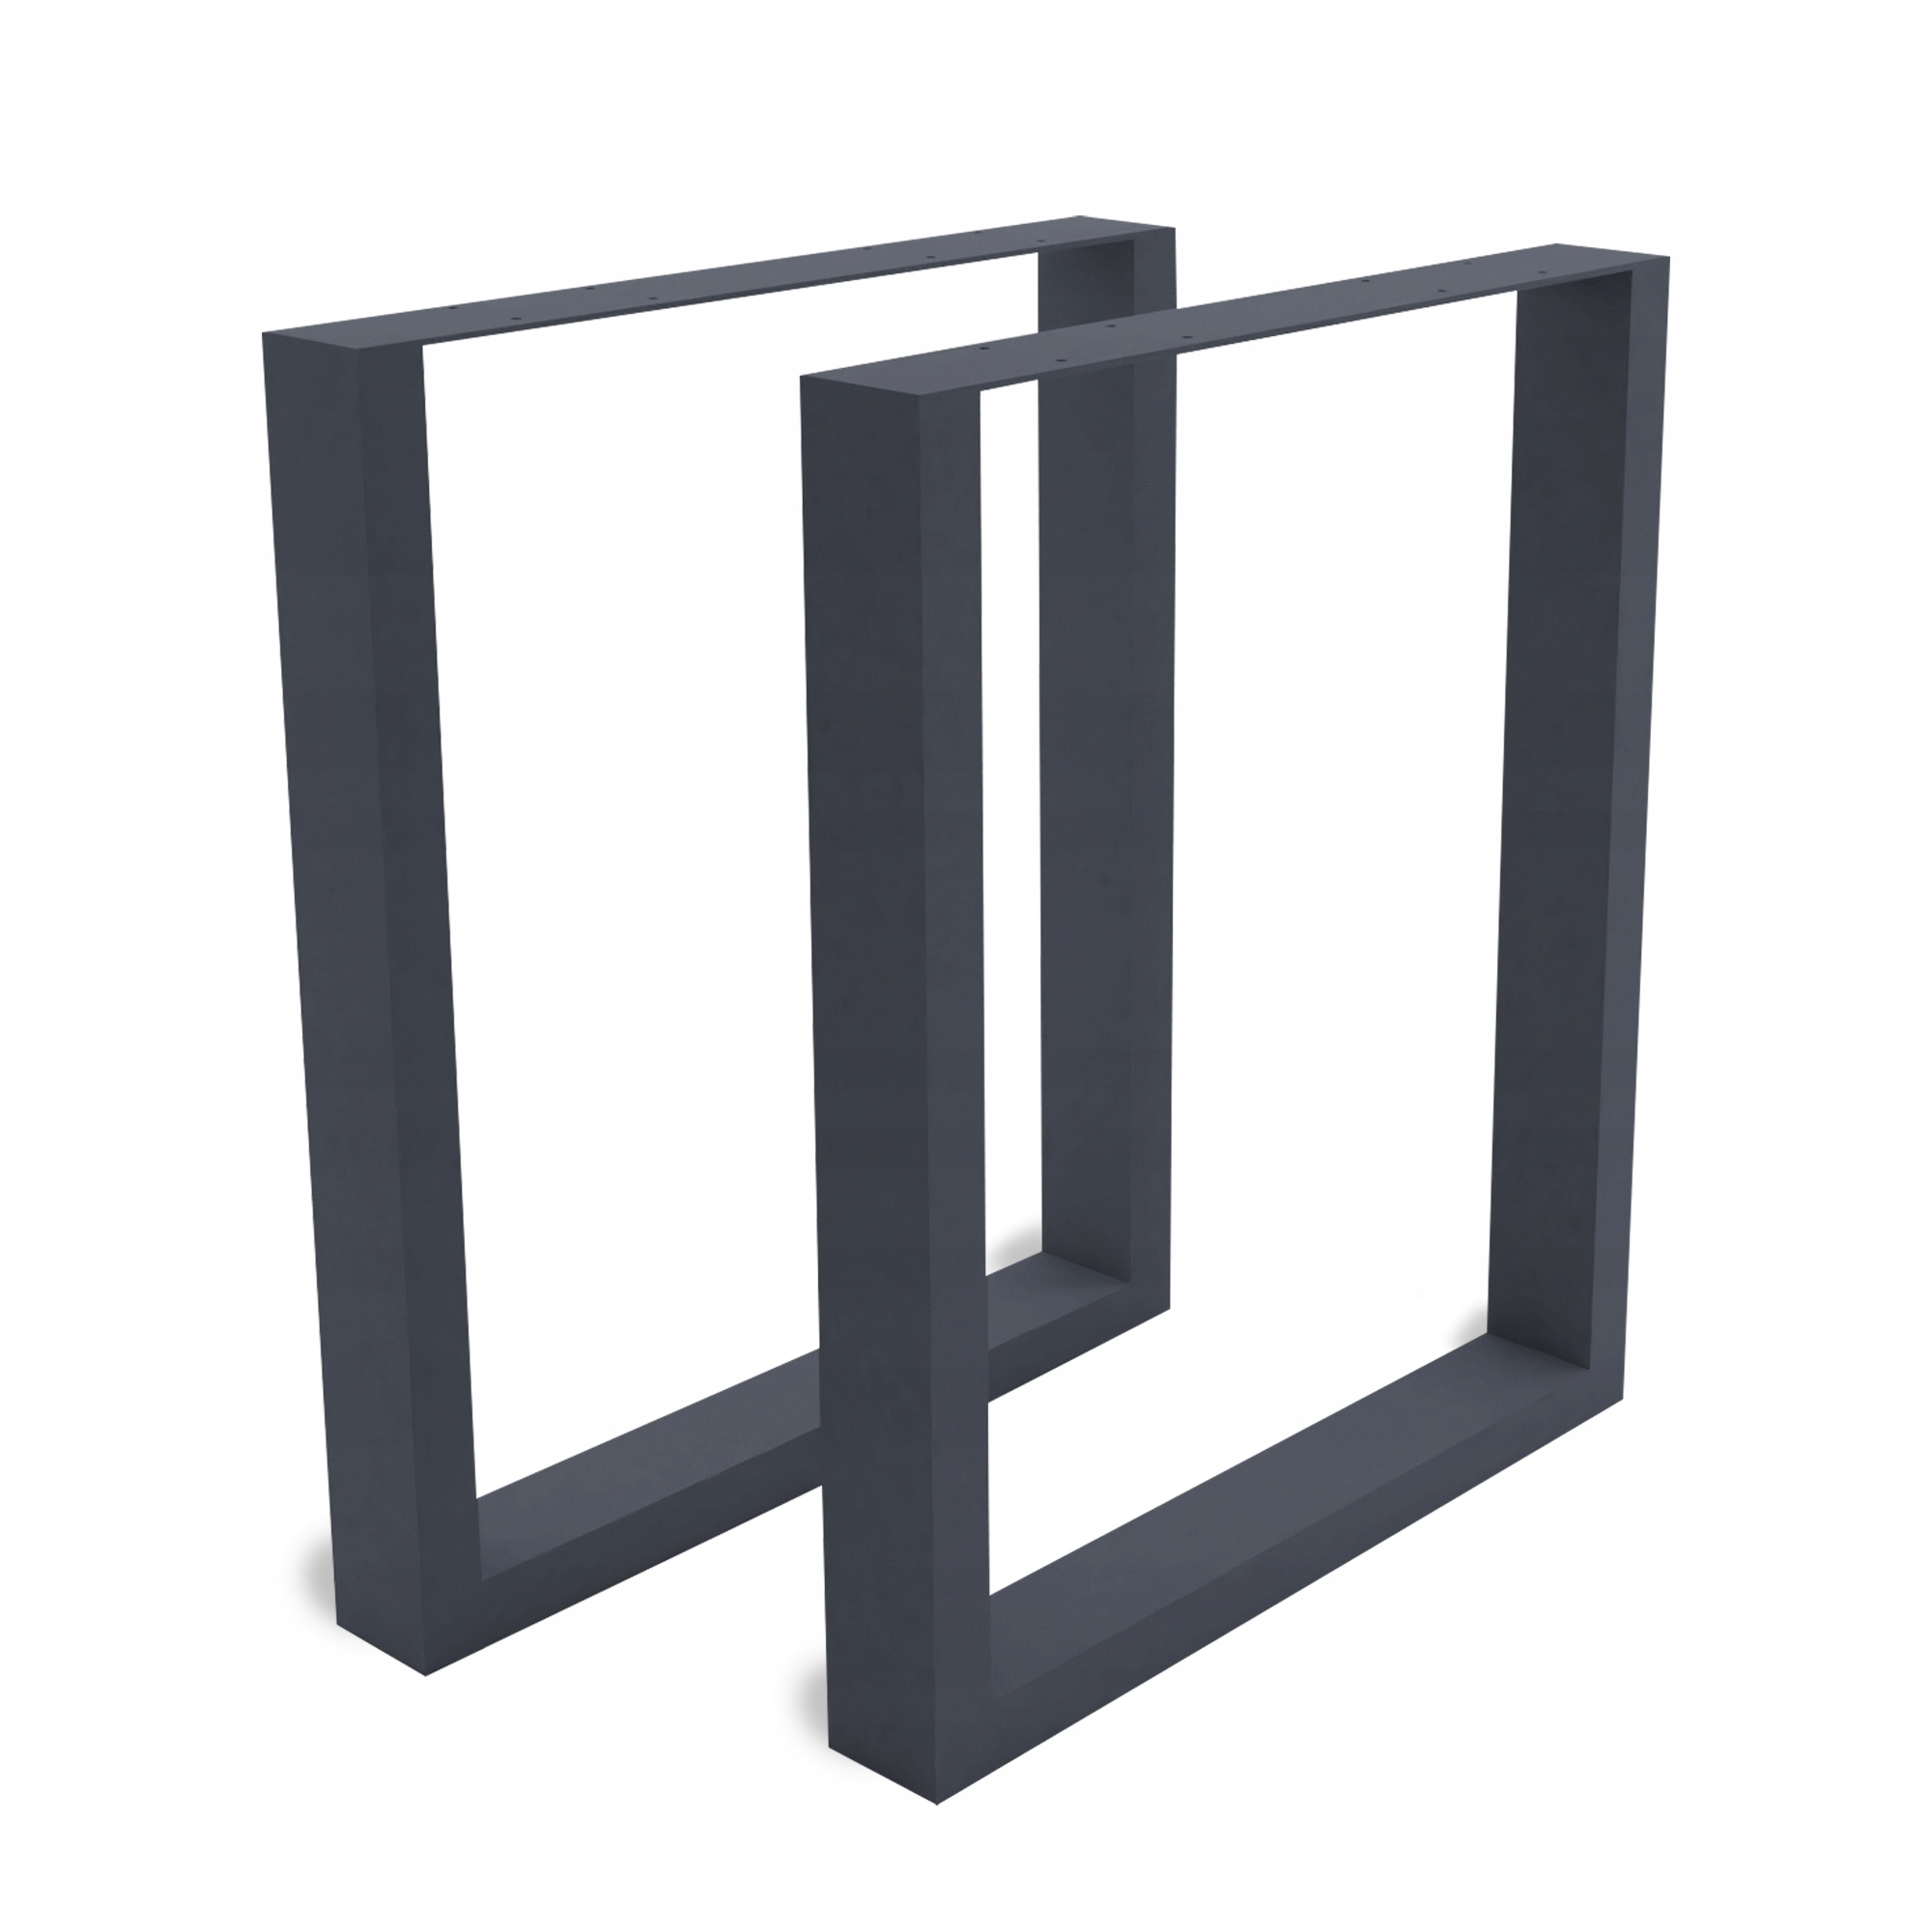 2x kovové stolové nohy 80x72 cm antracitové 6x2 cm